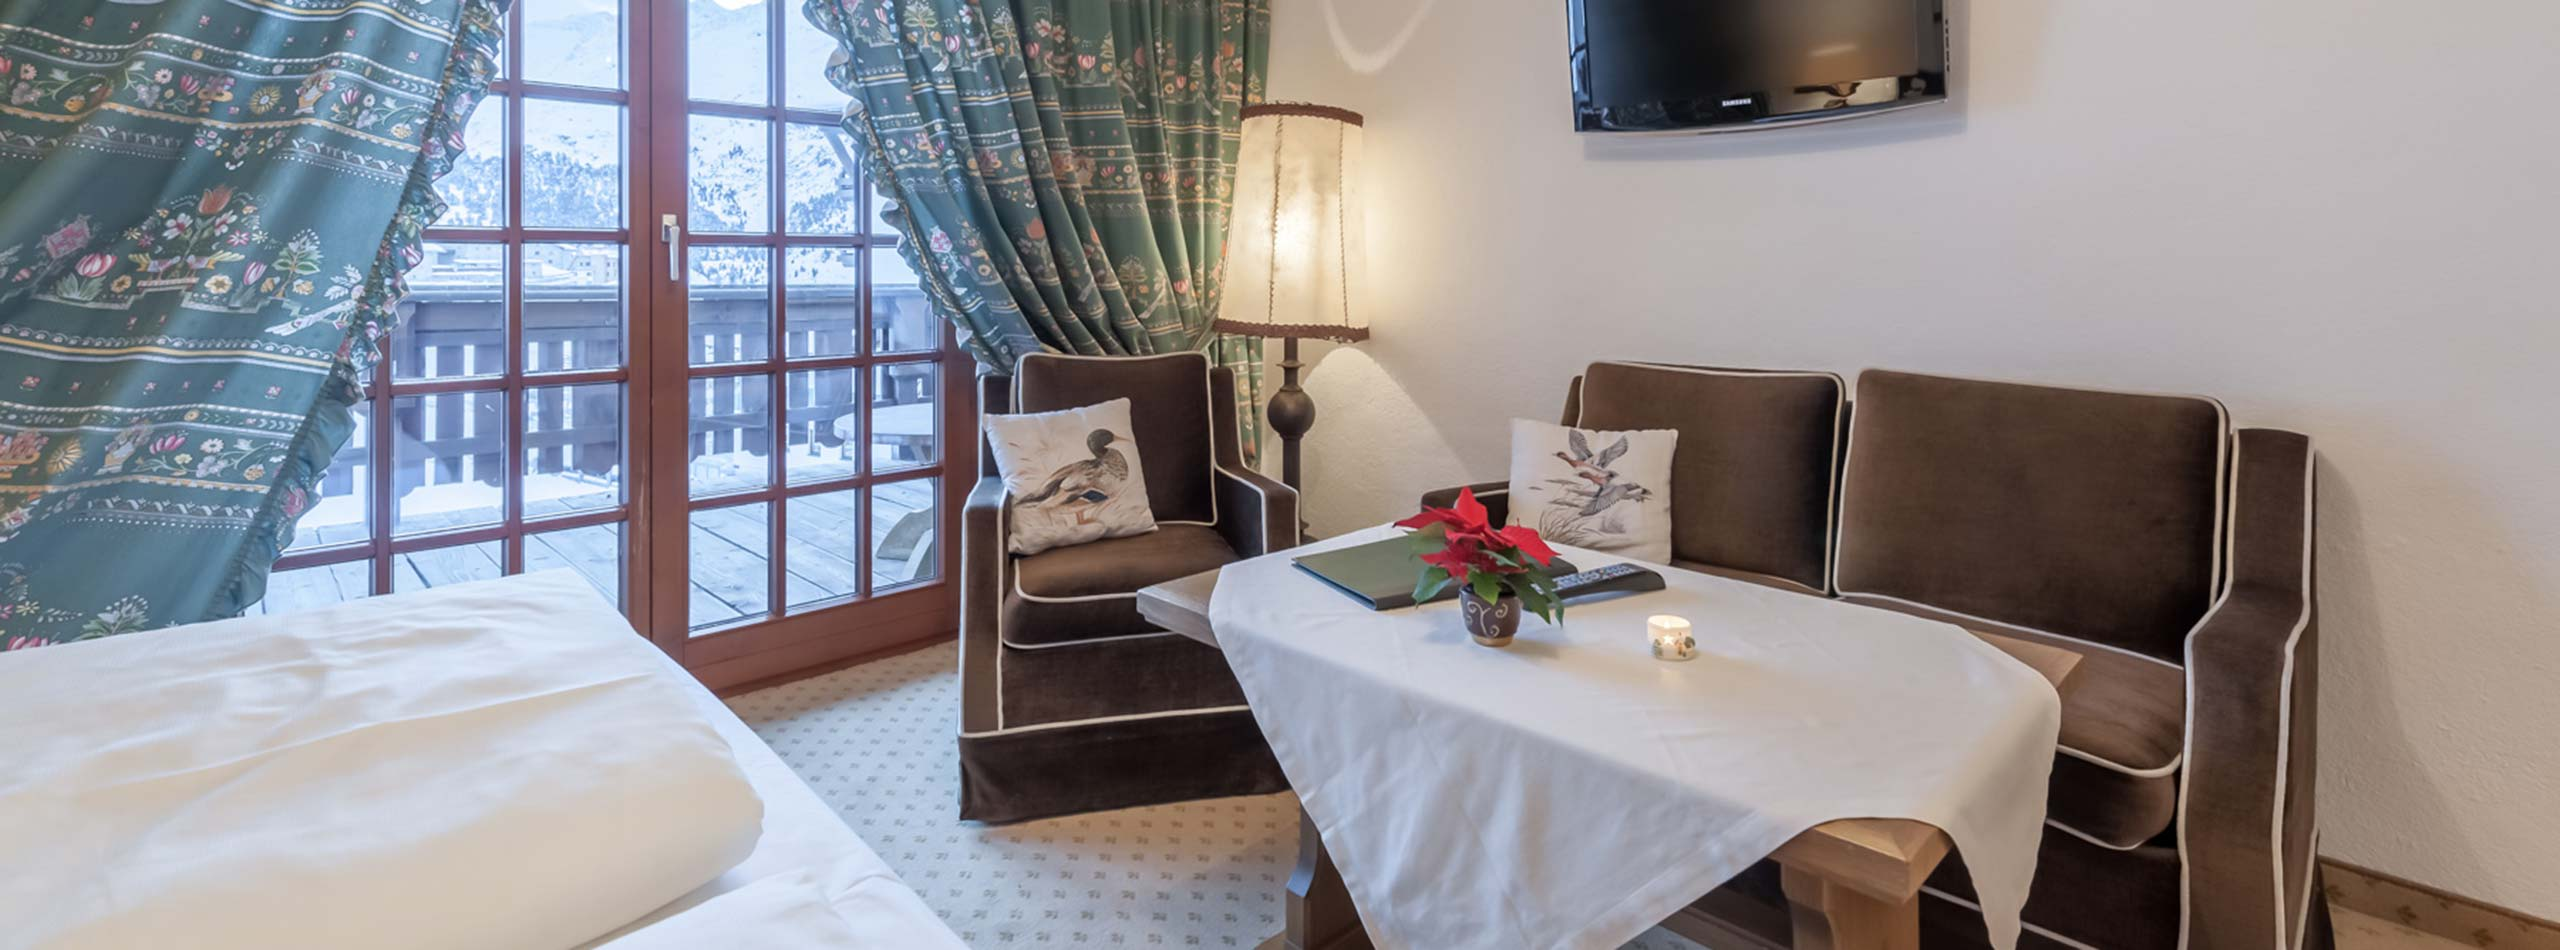 Zimmer und Angebote im Jagdhaus Panorama in Obergurgl